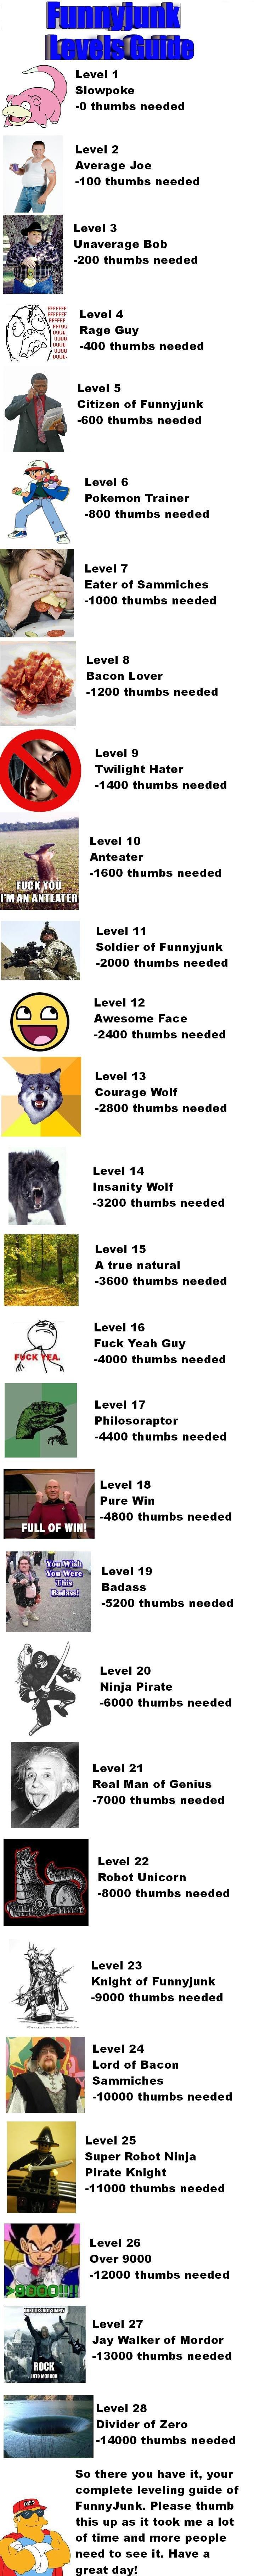 "Funnyjunk level guide. . Level 1 Slowpoke thumbs needed Level 2 Average Joe 100 thumbs needed Level 3 Unaverage Bob 200 thumbs needed Level 4 Cf) FFCCFF BEL"" Ra"